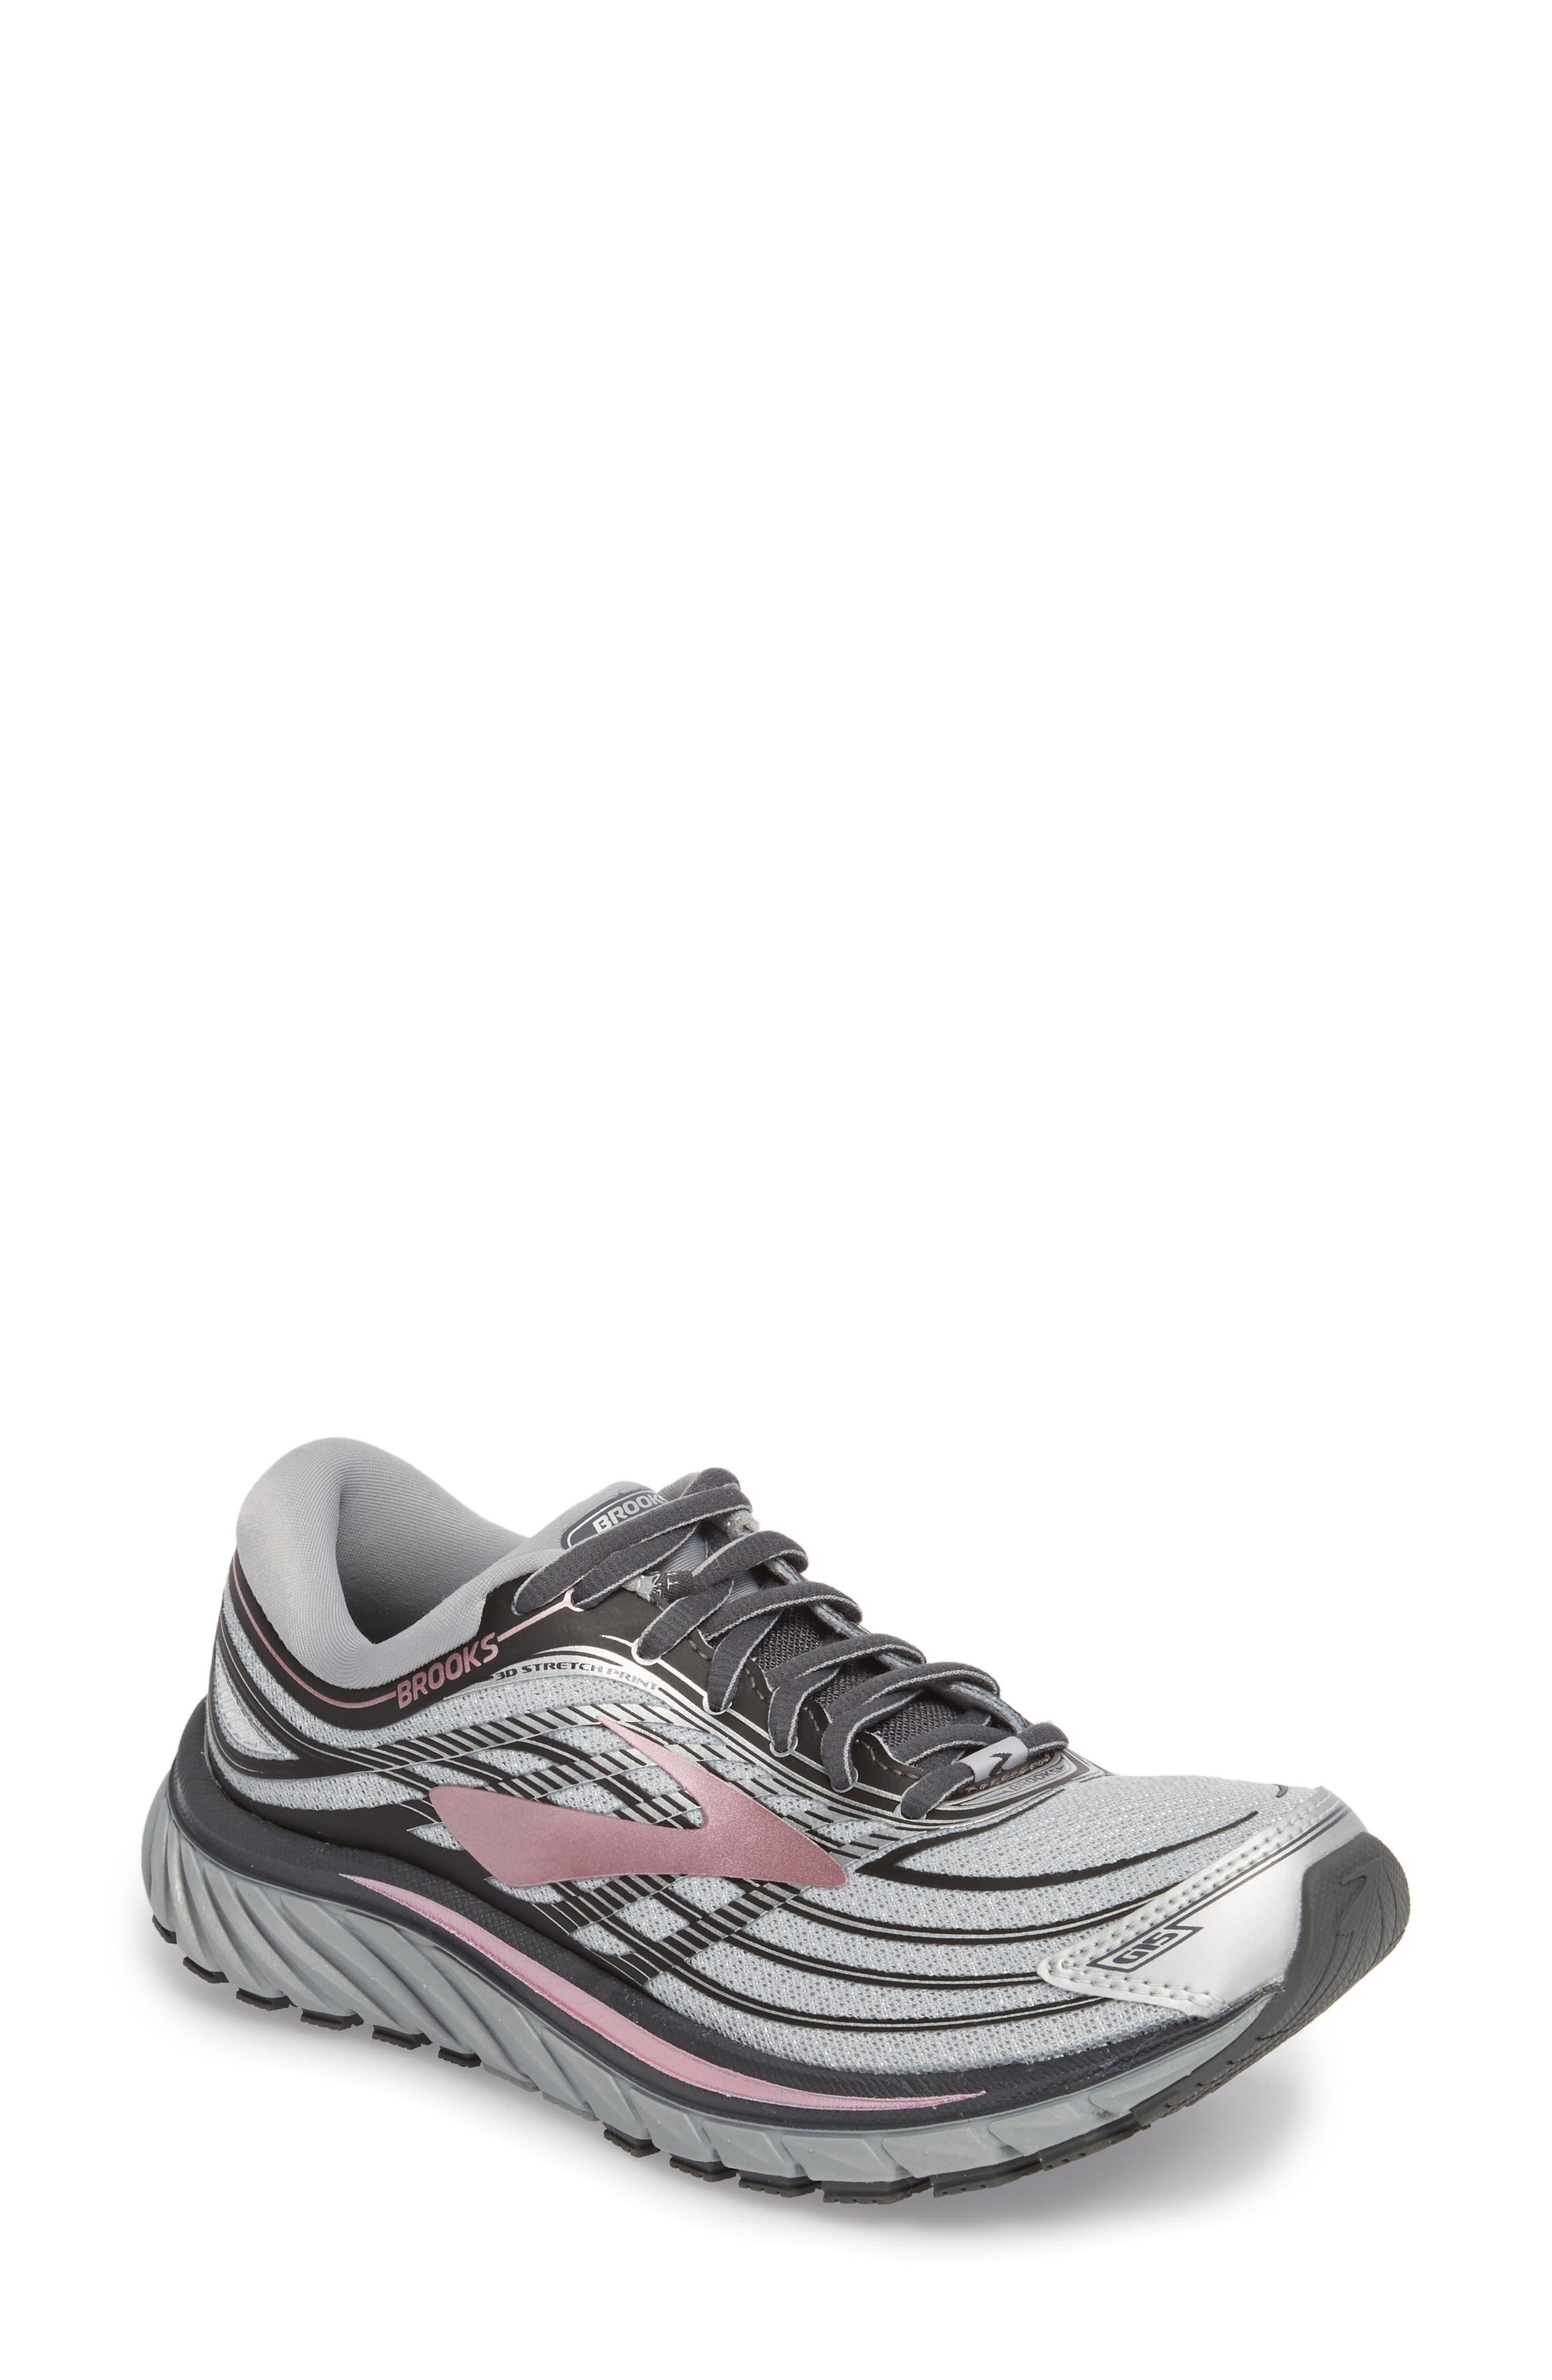 Glycerin 15 Running Shoe,                         Main,                         color, Silver/ Grey/ Rose